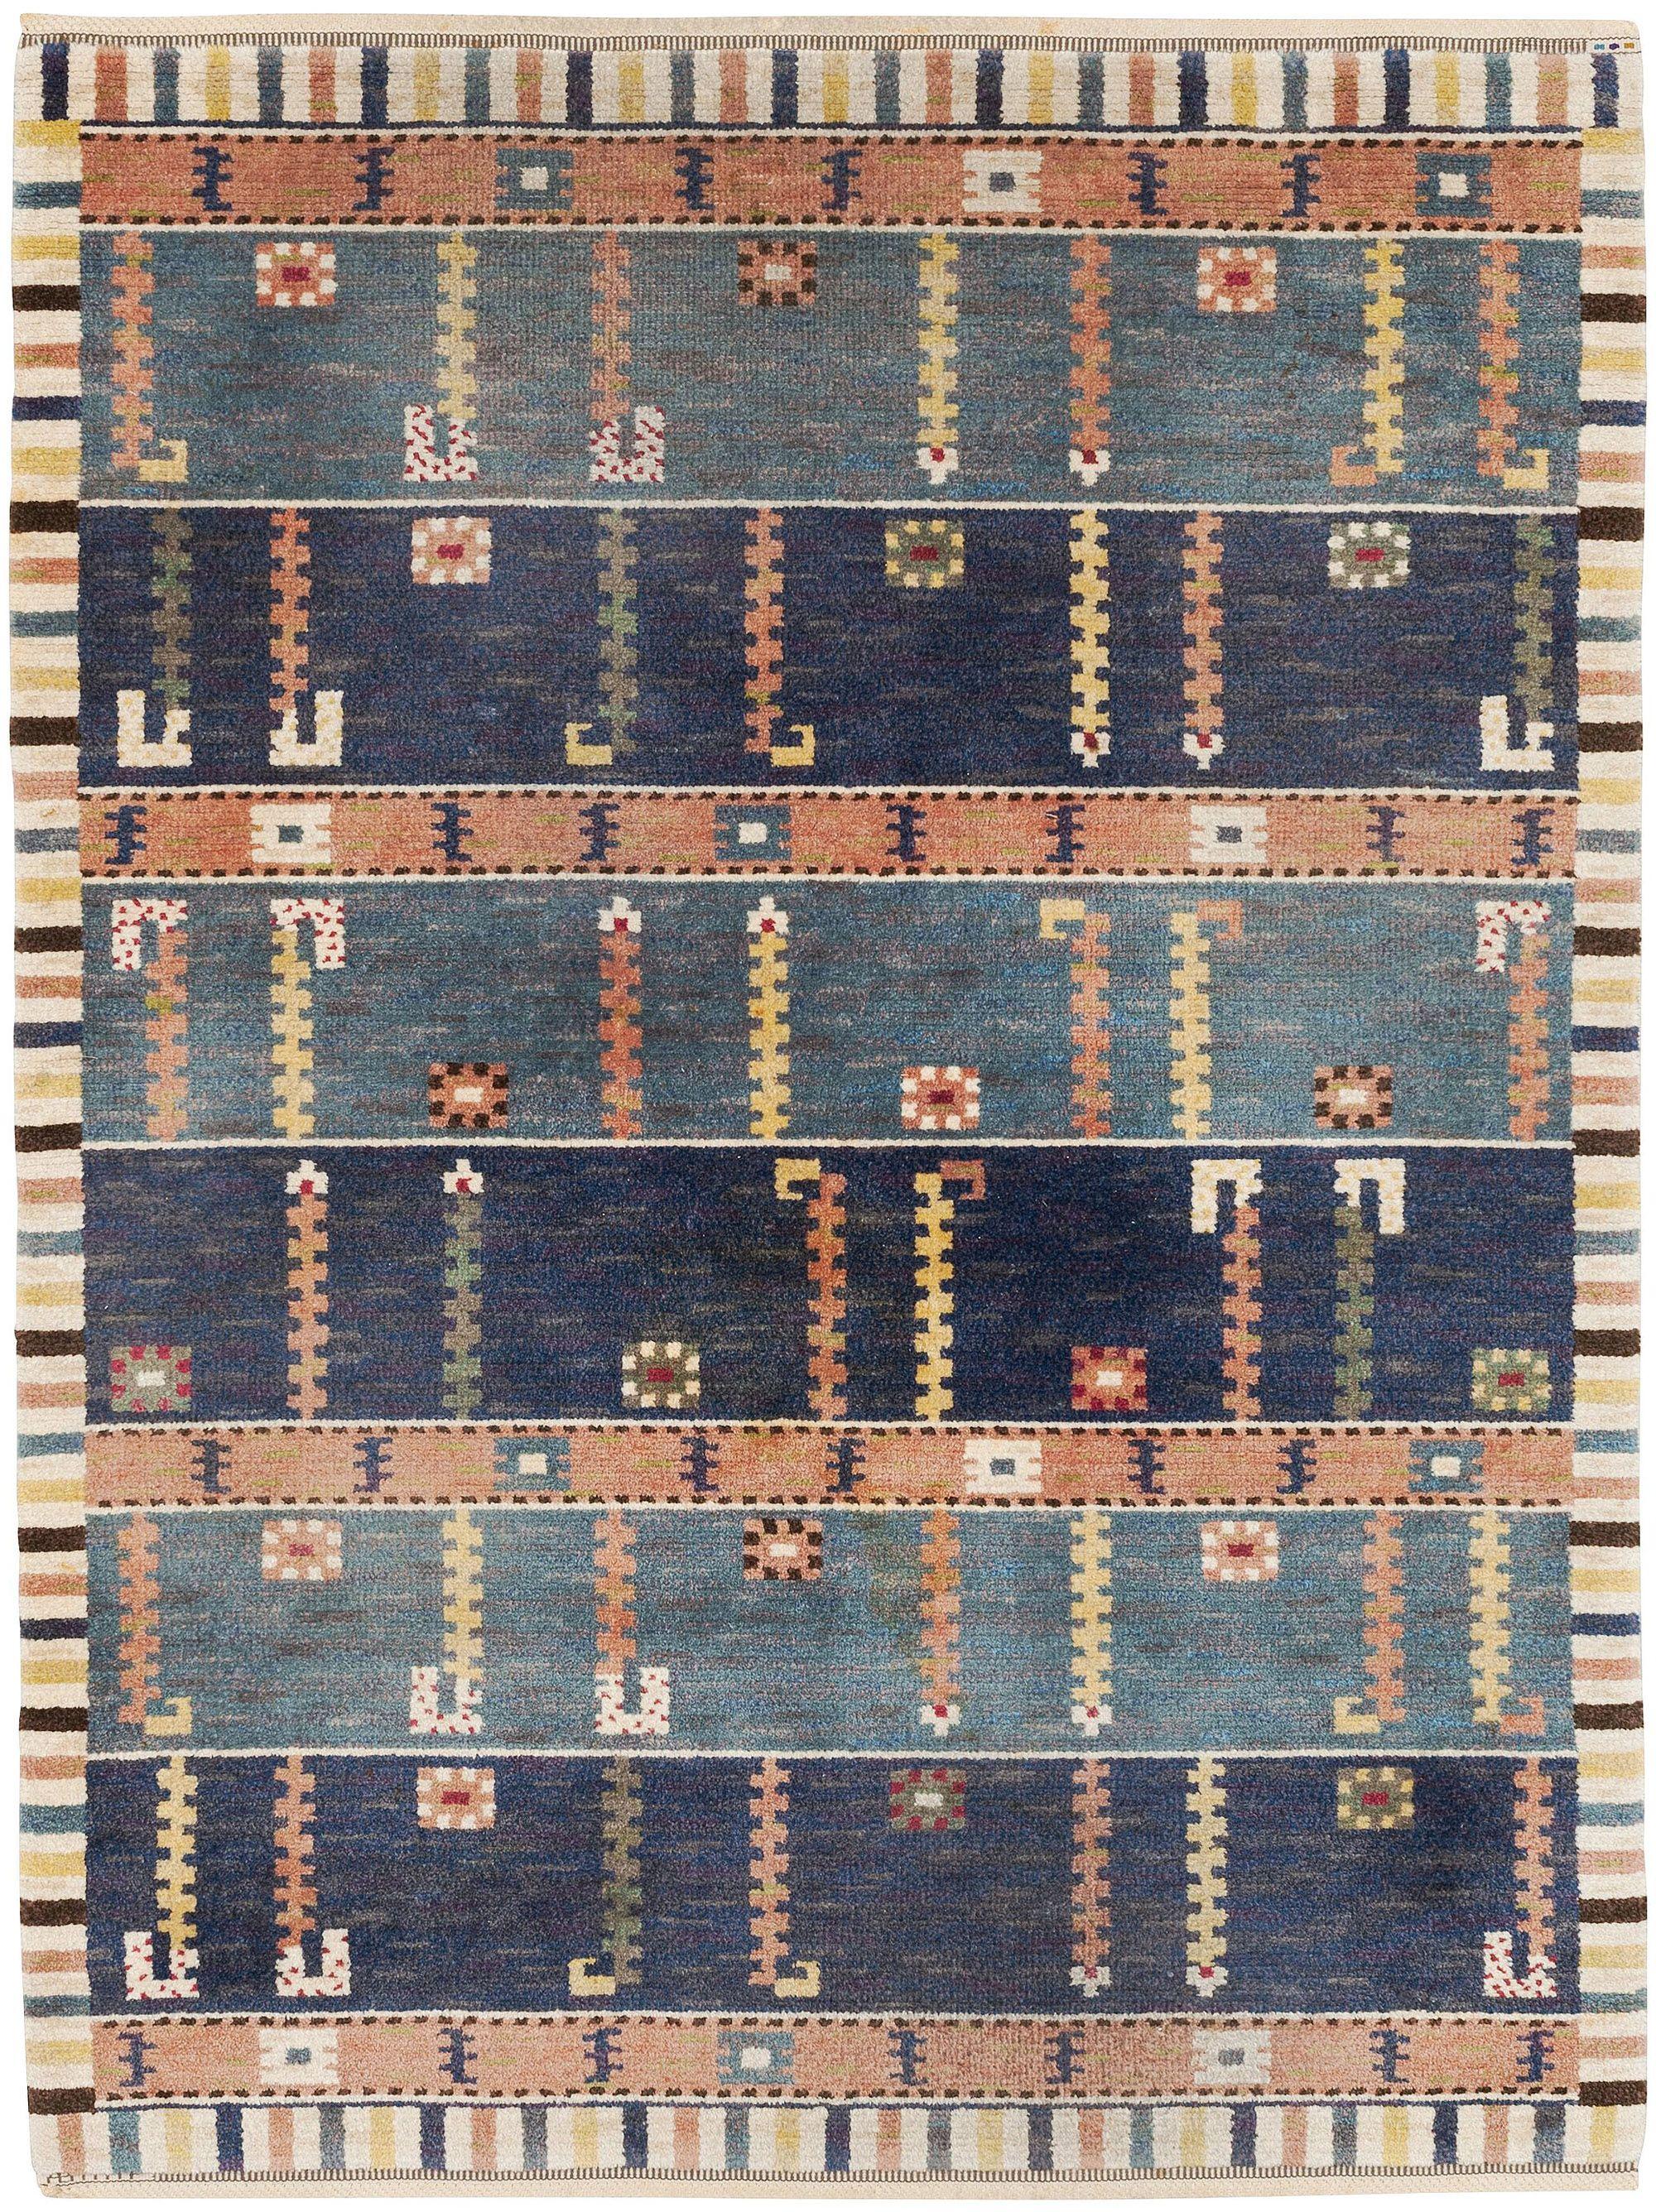 A Swedish Pile Rug Standaren By Marta Maas Fjetterstrom Bb5382 By Doris Leslie Blau 8 1 X 6 2 Scandinavian Rug Swedish Rug Carpet Handmade